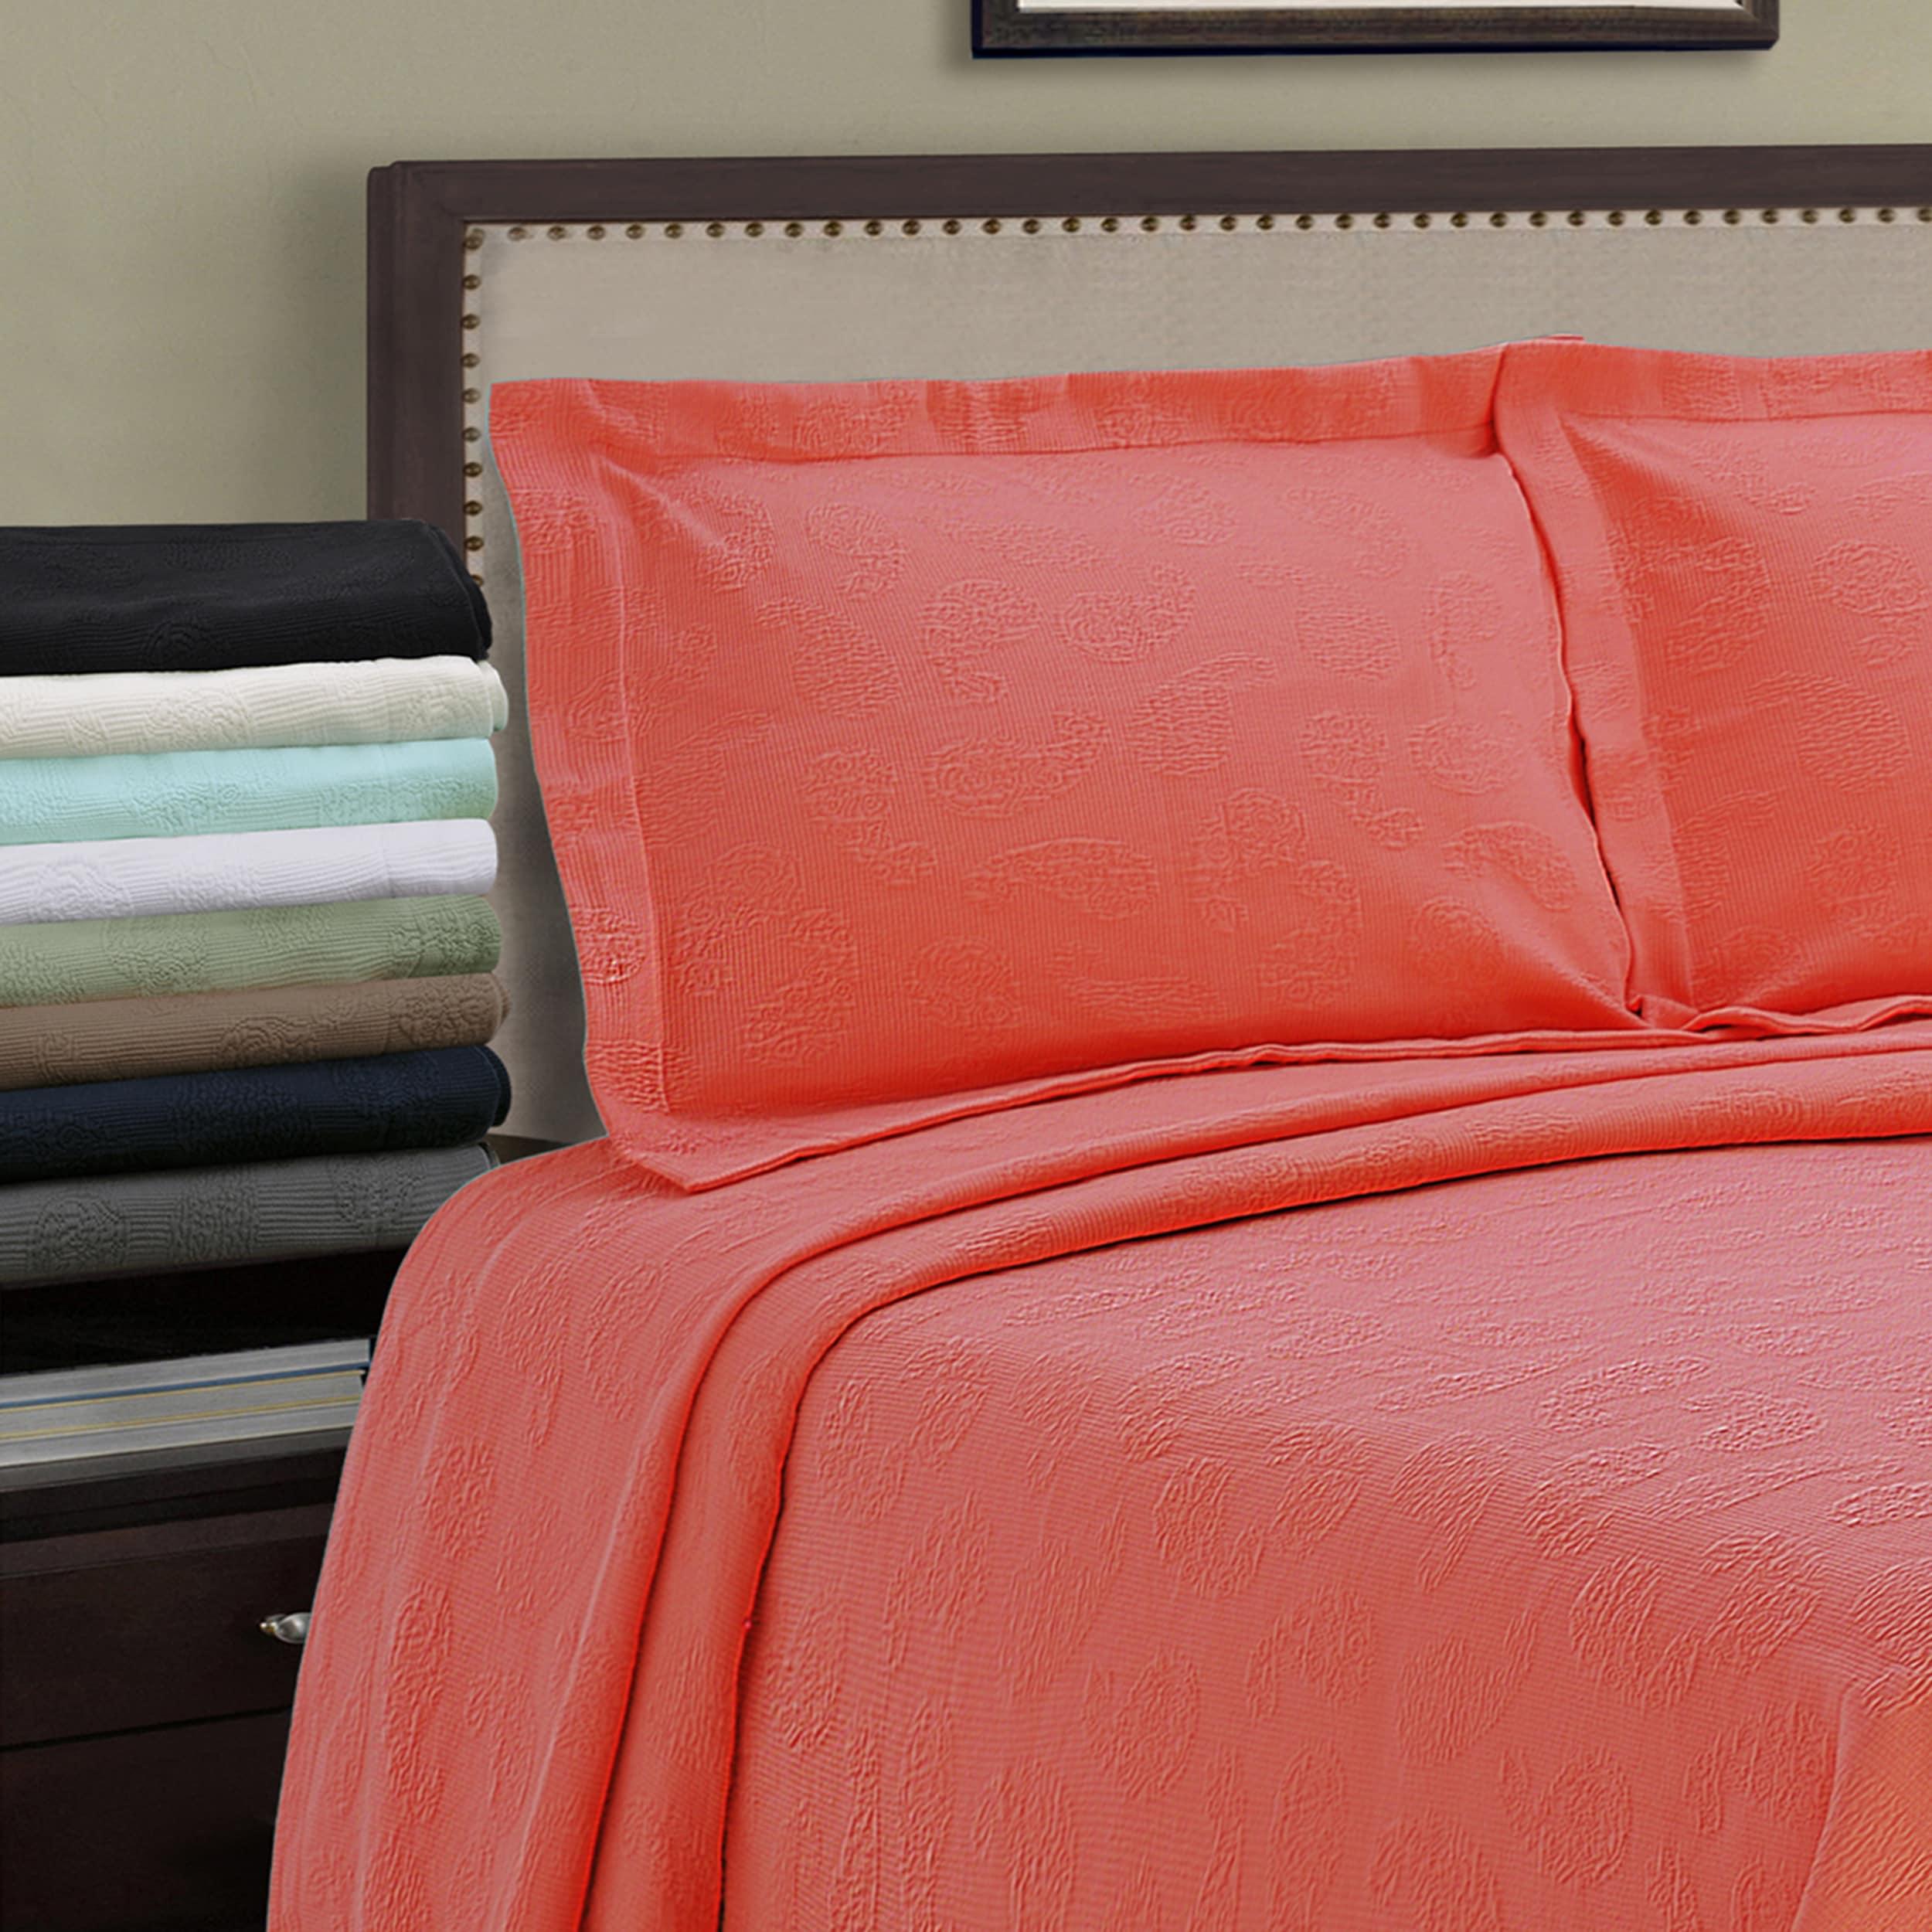 Superior Jacquard Matelasse Paisley Cotton Bedspread Set ...